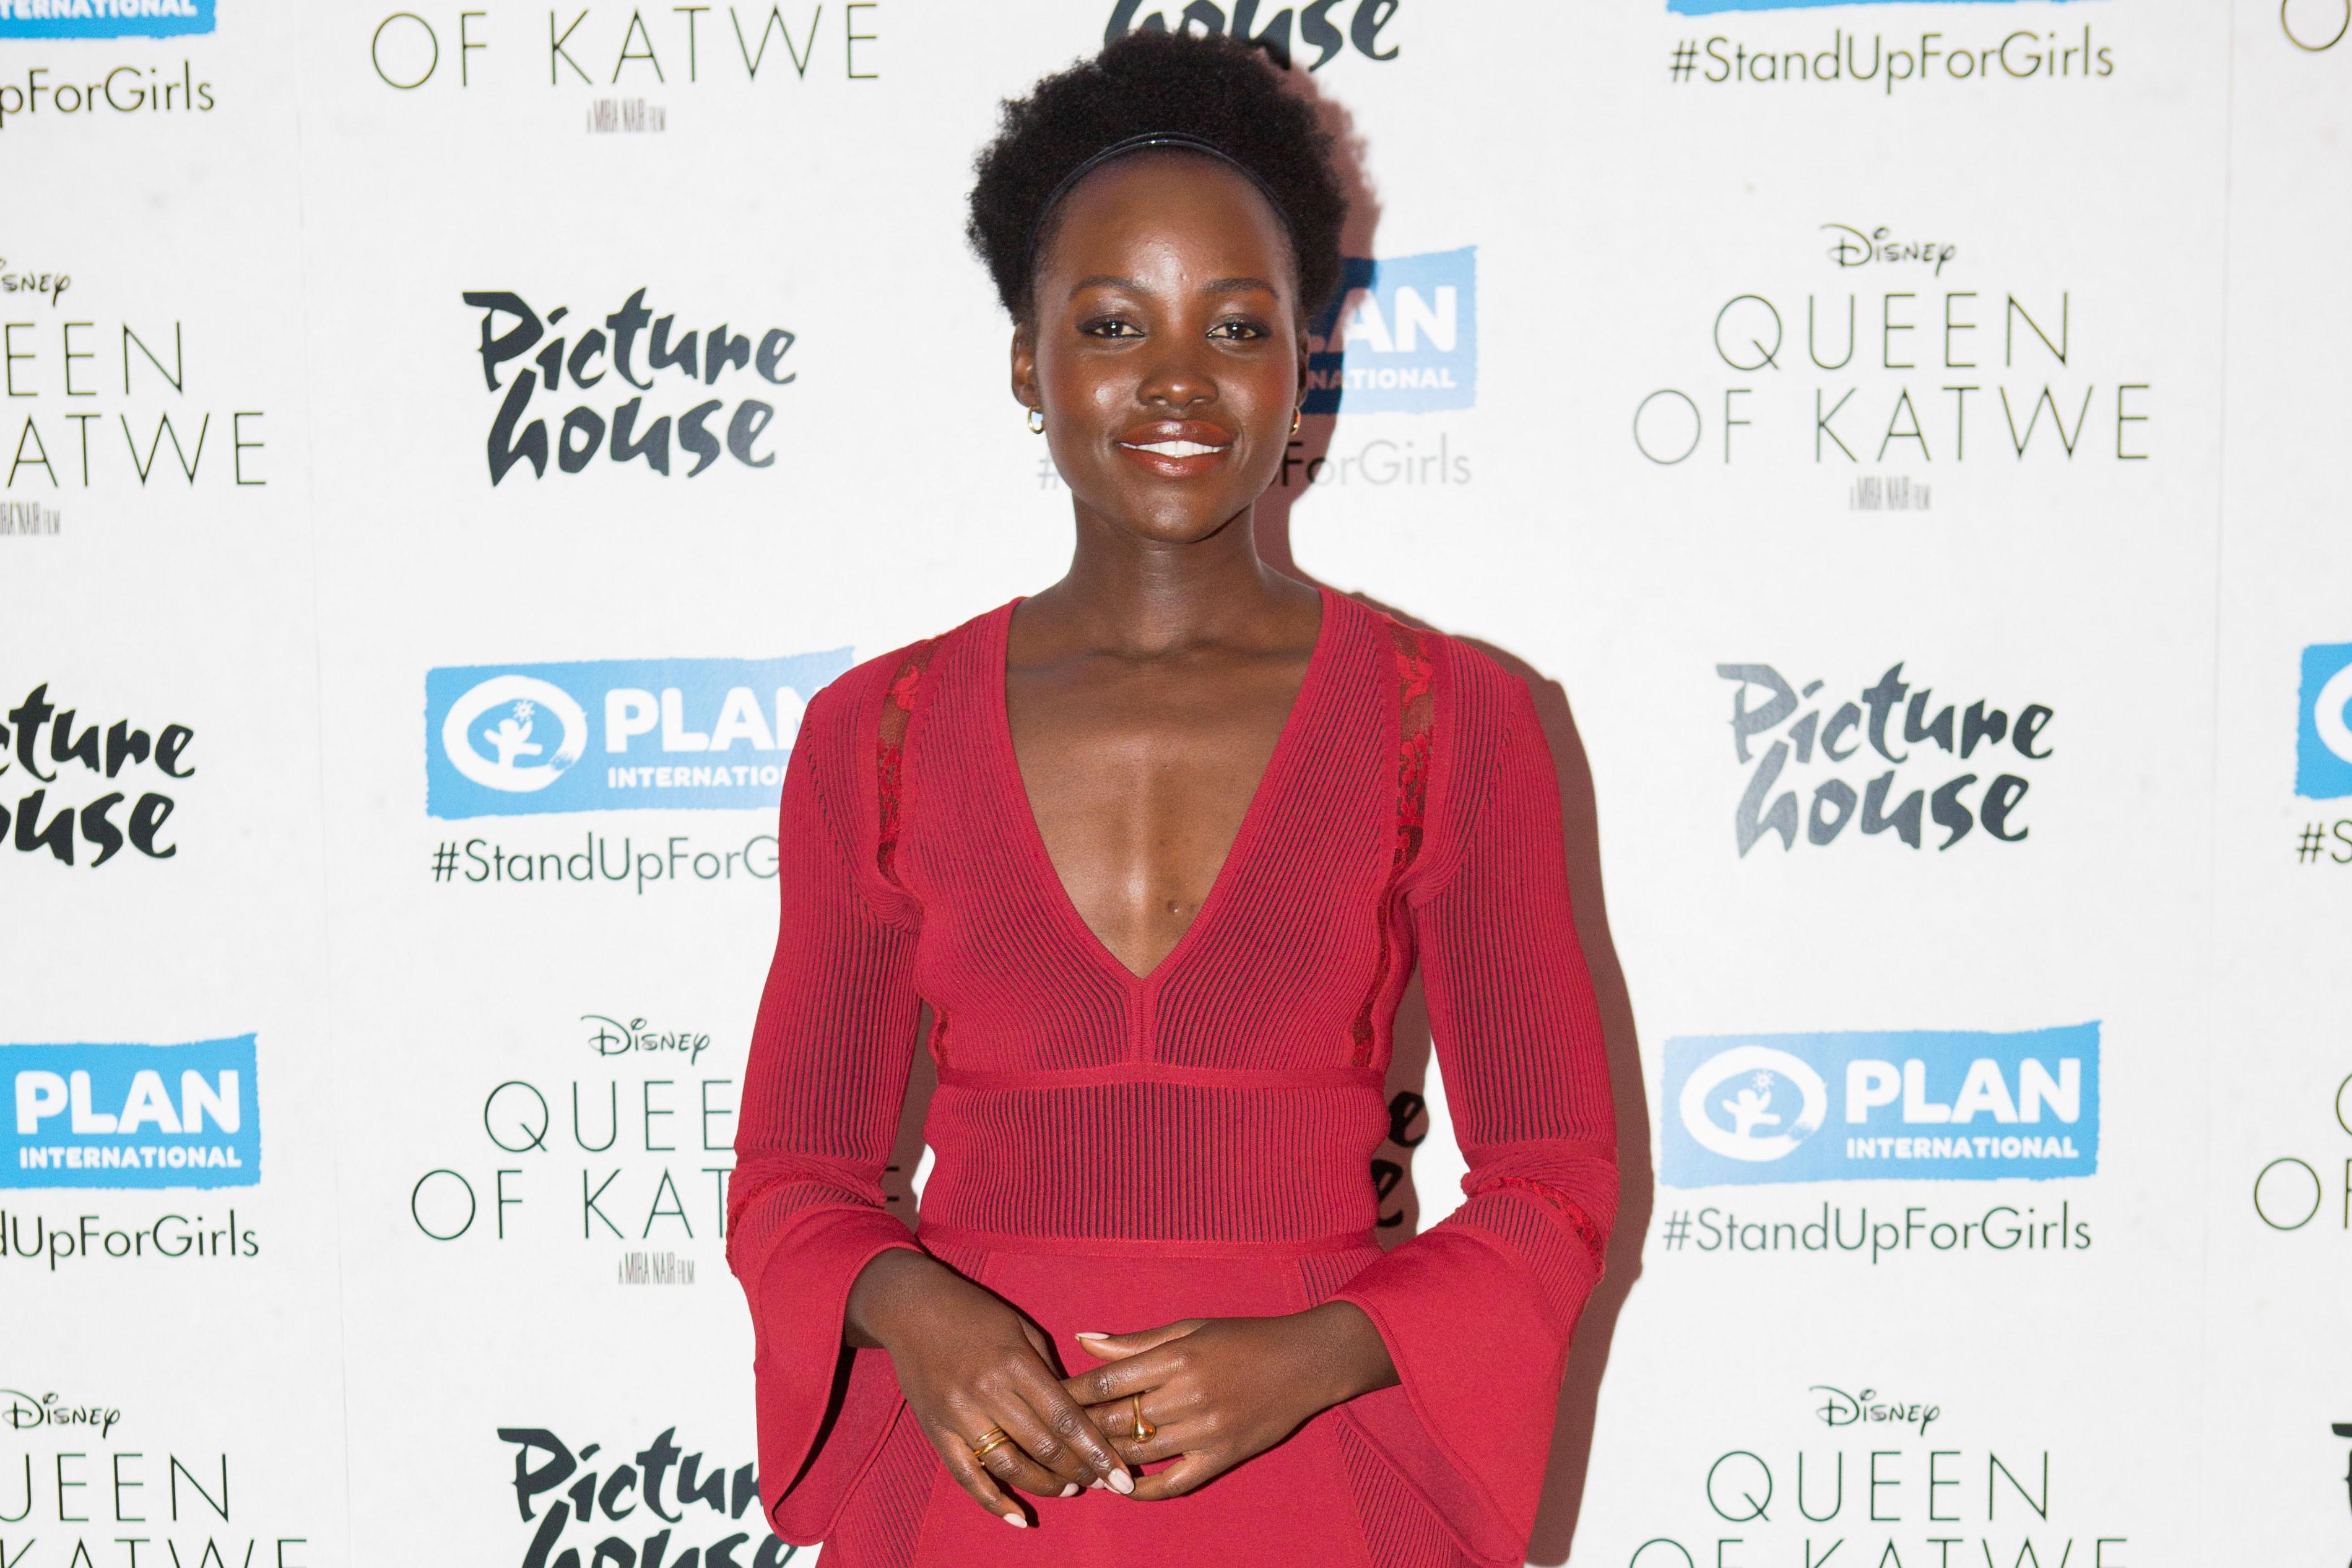 Lupita Nyongo arriving at the Plan International UK screening of the Queen of Katwe